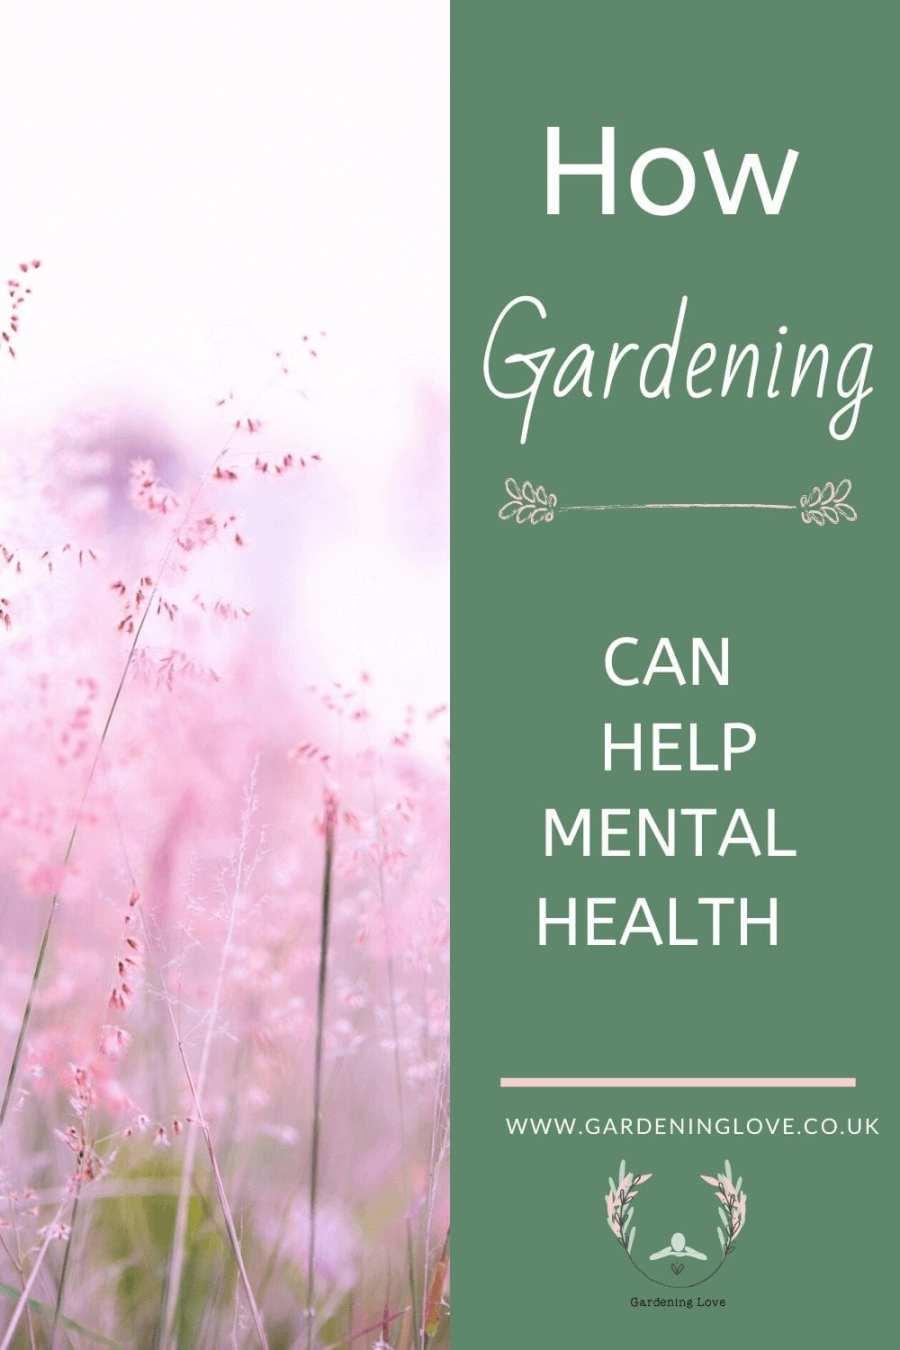 how gardening can help mental health. #garden #mentalhealth #wellbeing #outdoors